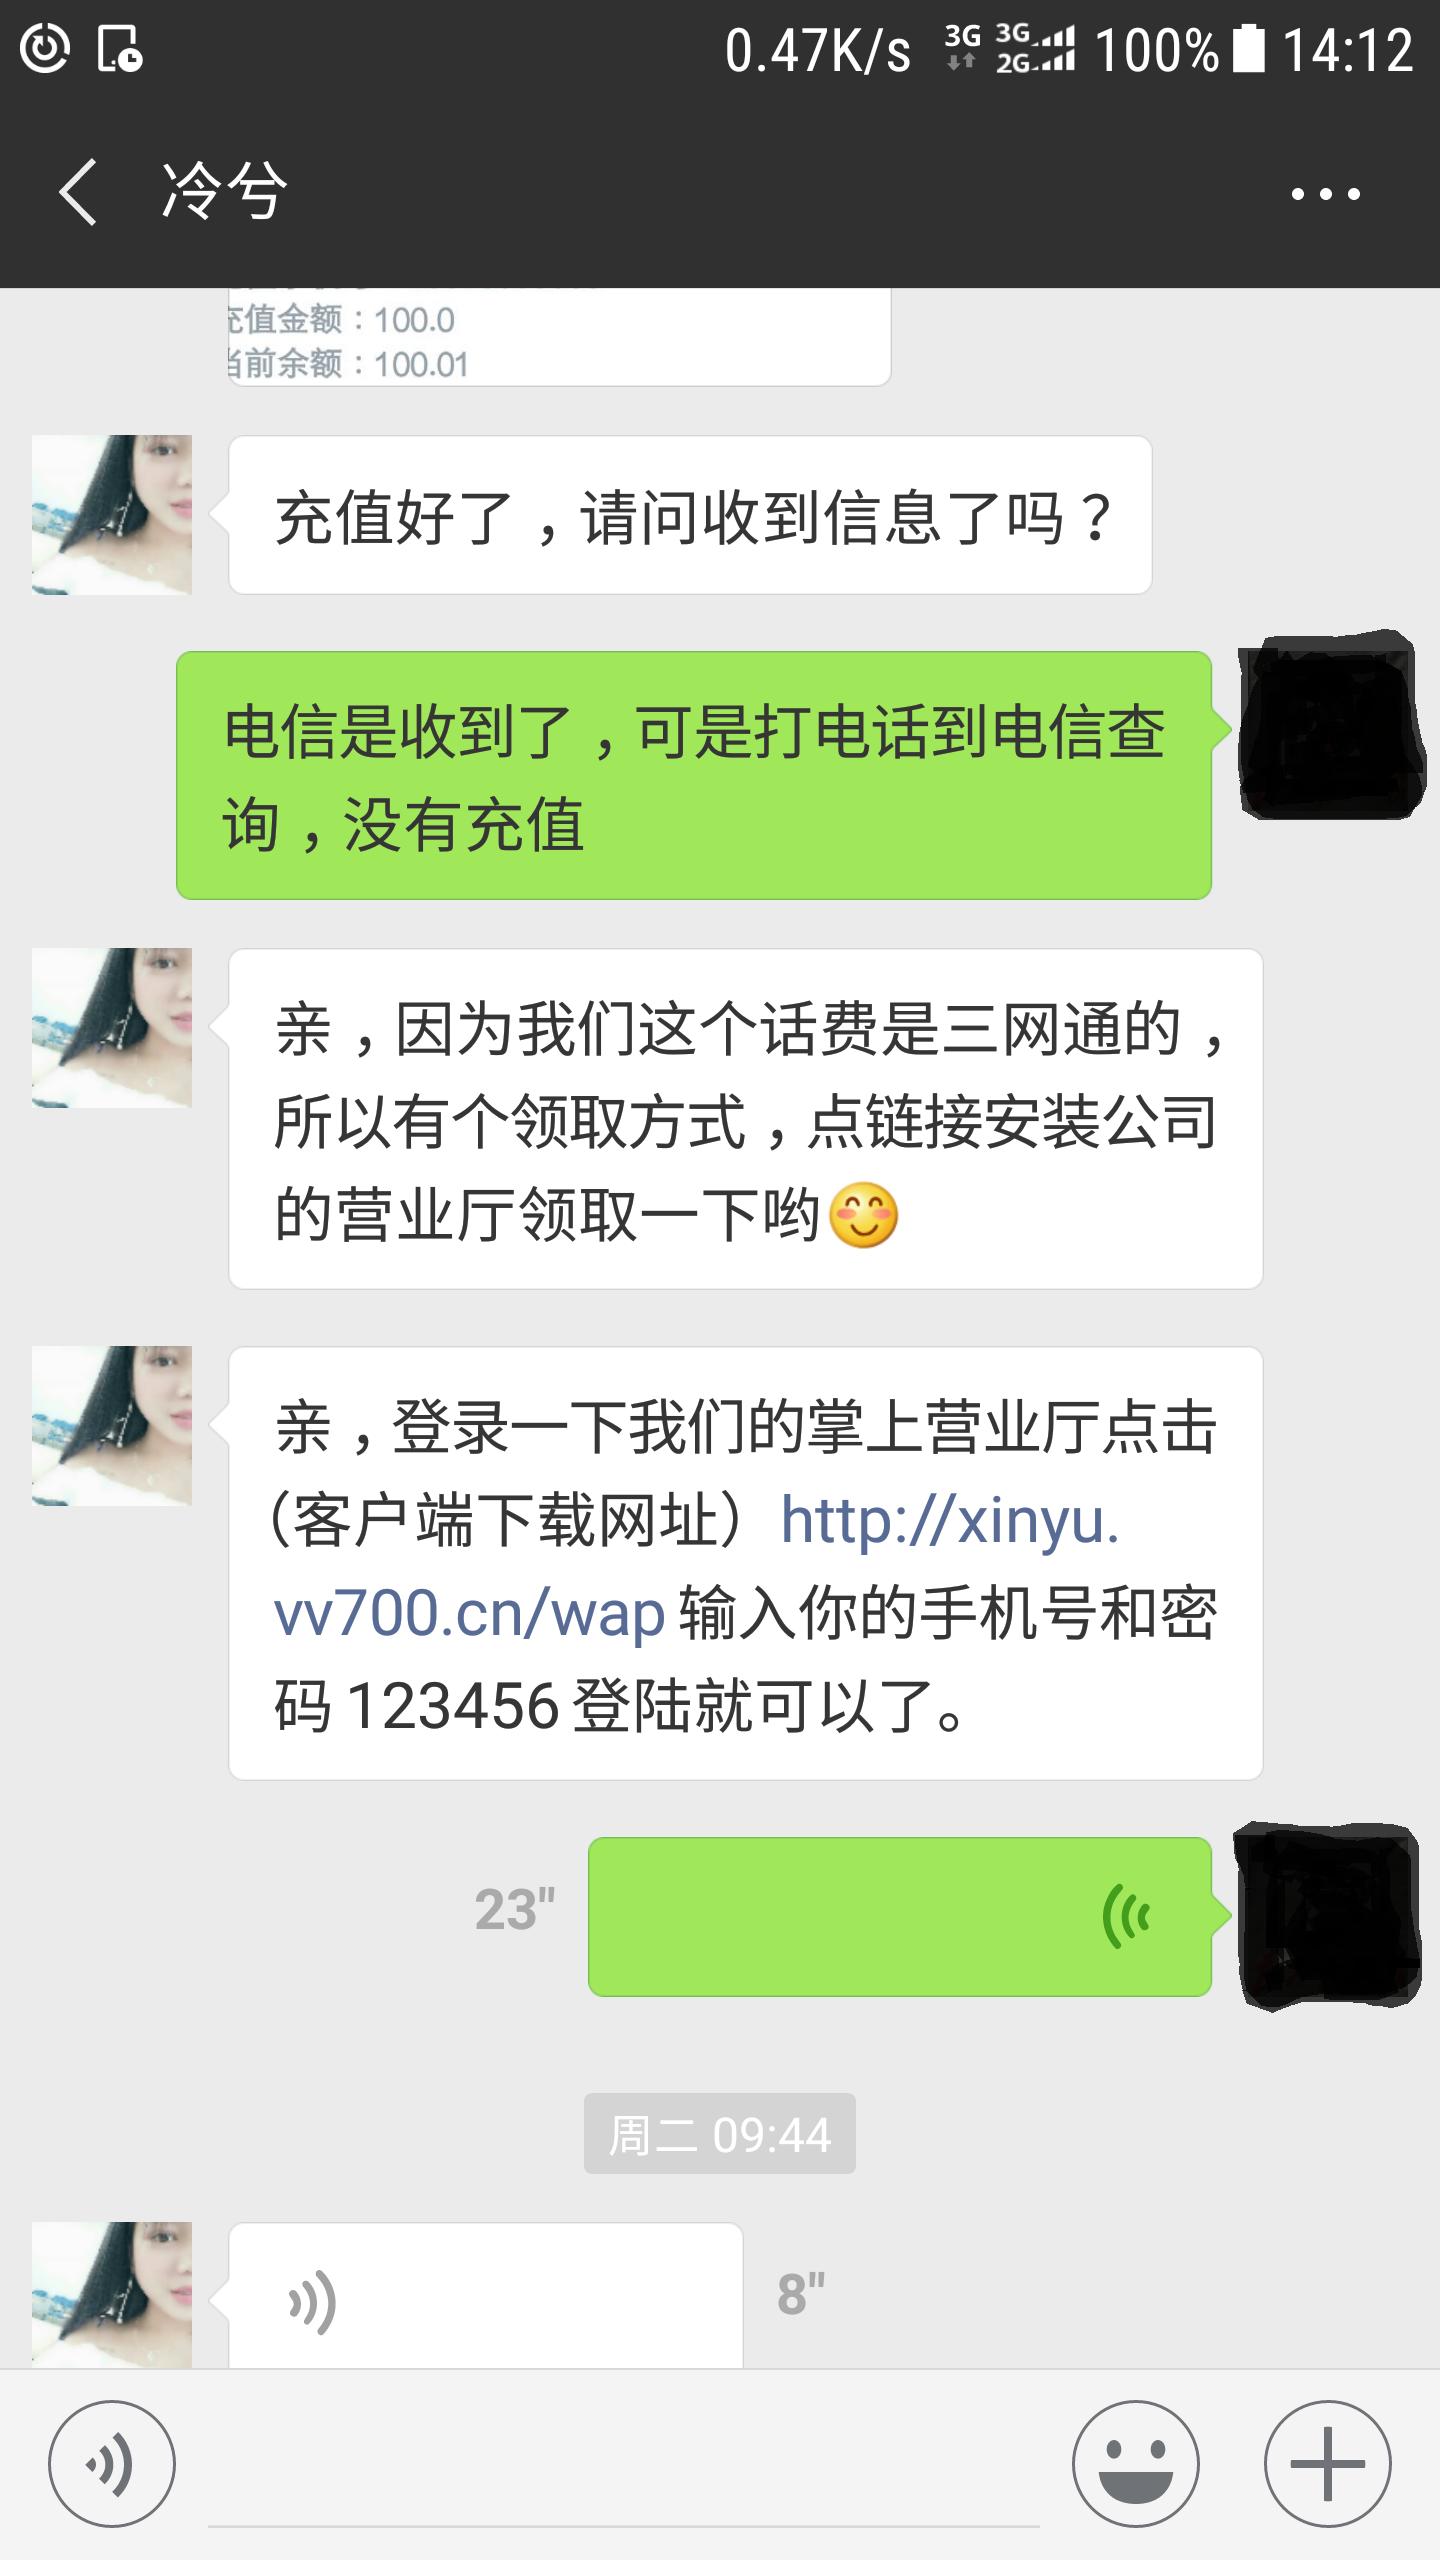 Screenshot_20180705-141221.png